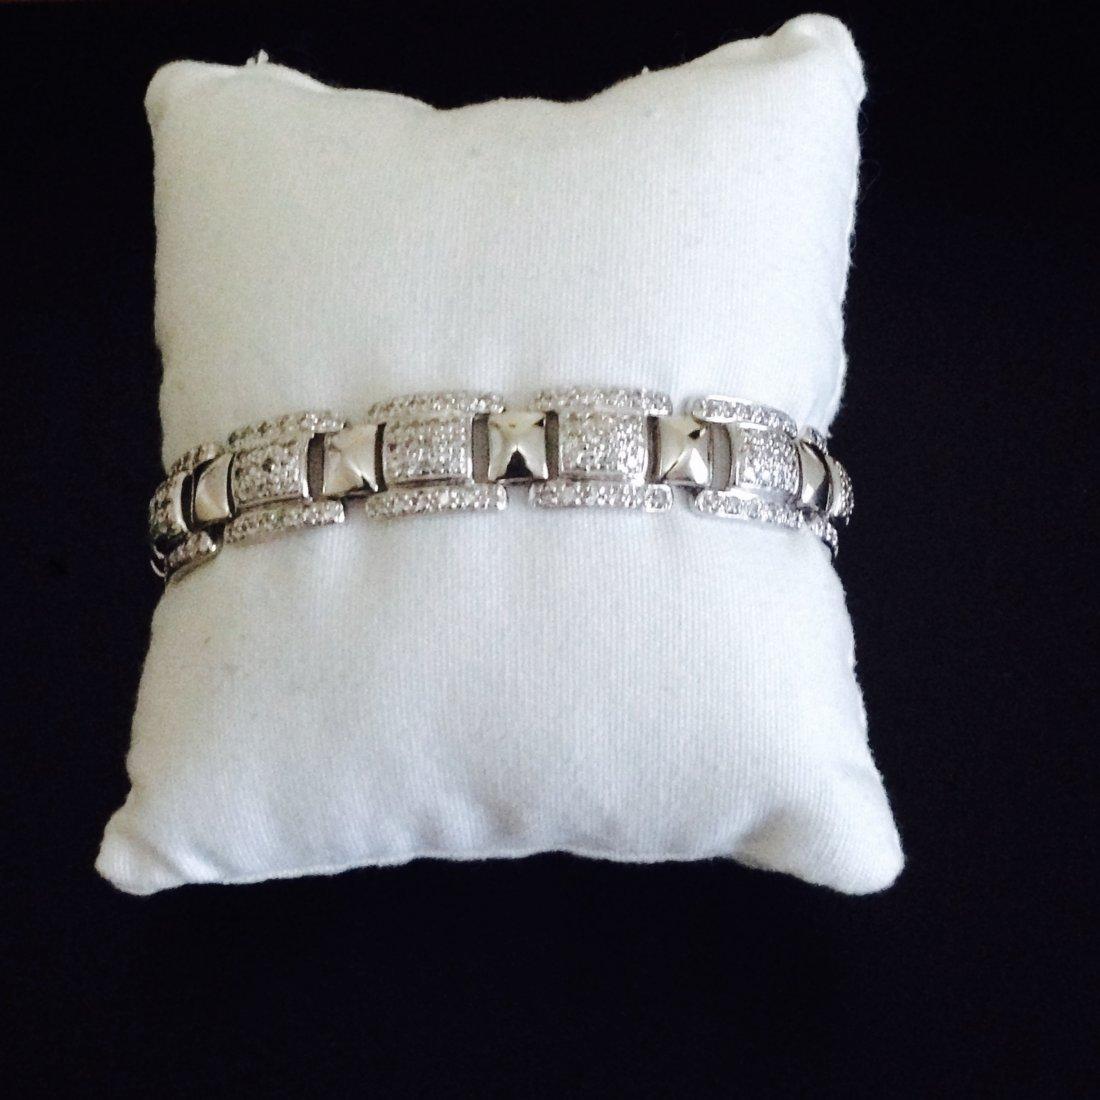 Diamond Bracelet Set In 14K White Gold